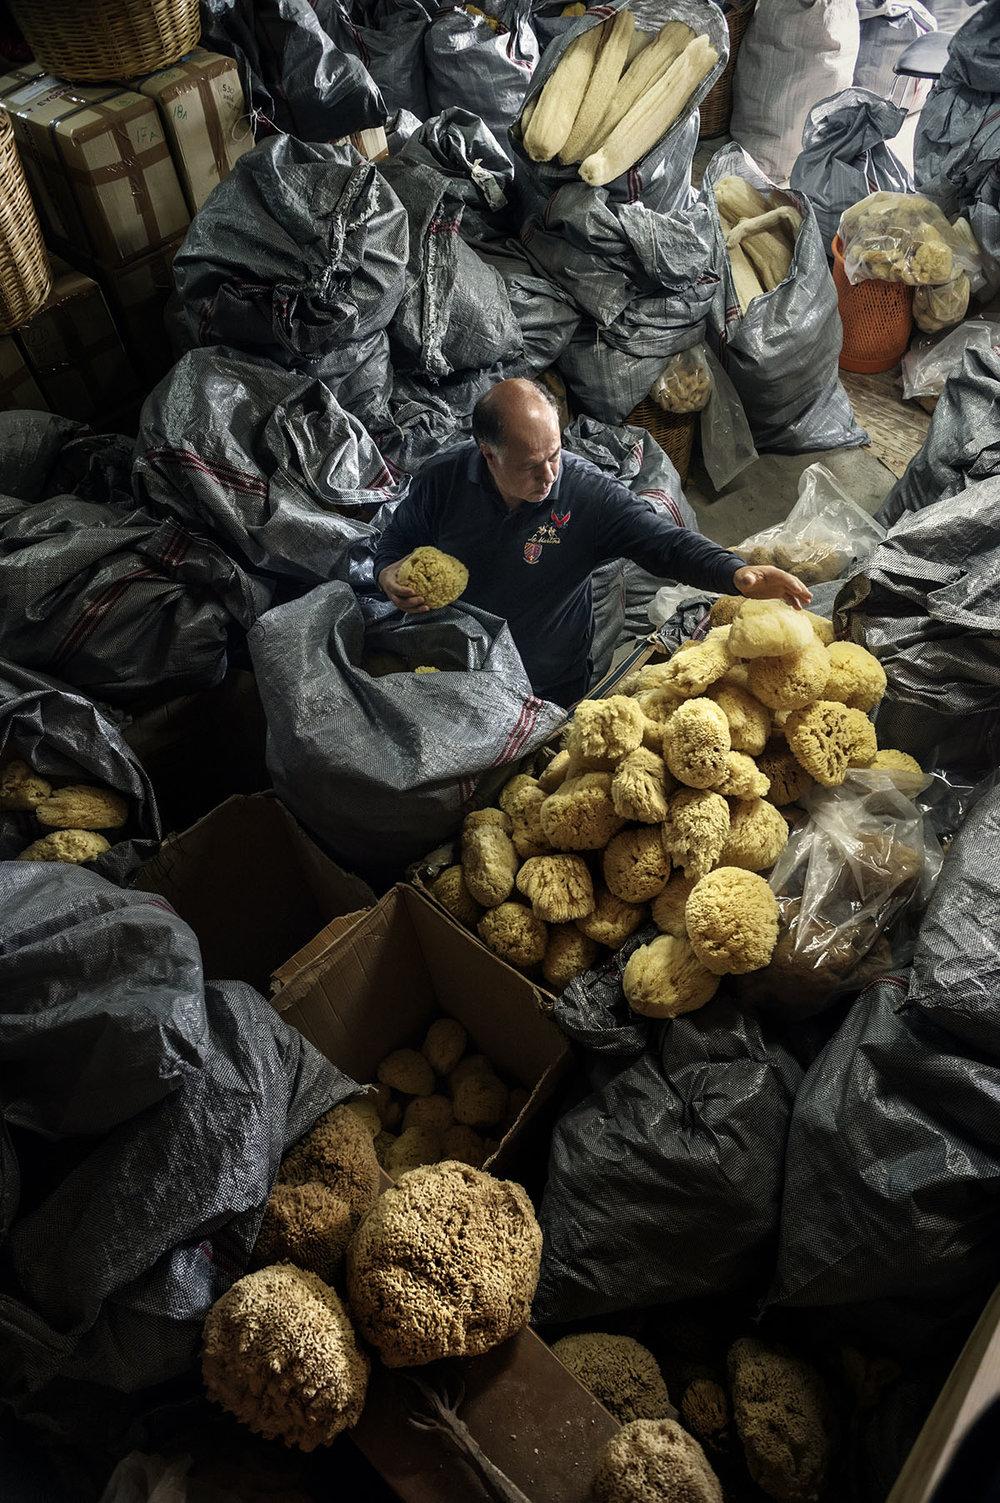 Greece, Kalymnos,April 2015, Sponges in the factory of Manolis Makryllos.